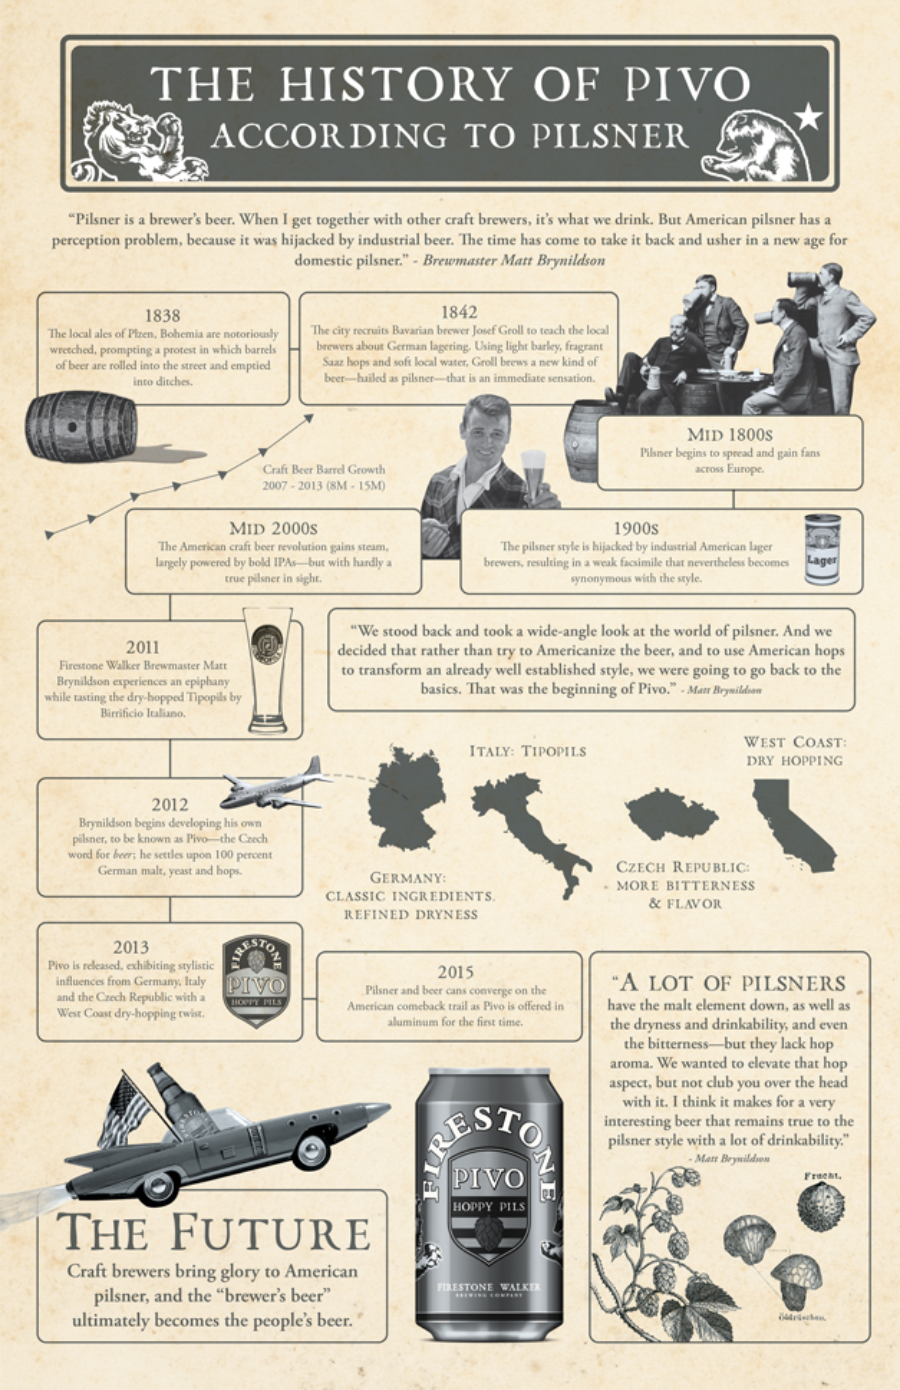 firestone-walker-a-history-of-pilsner-beer